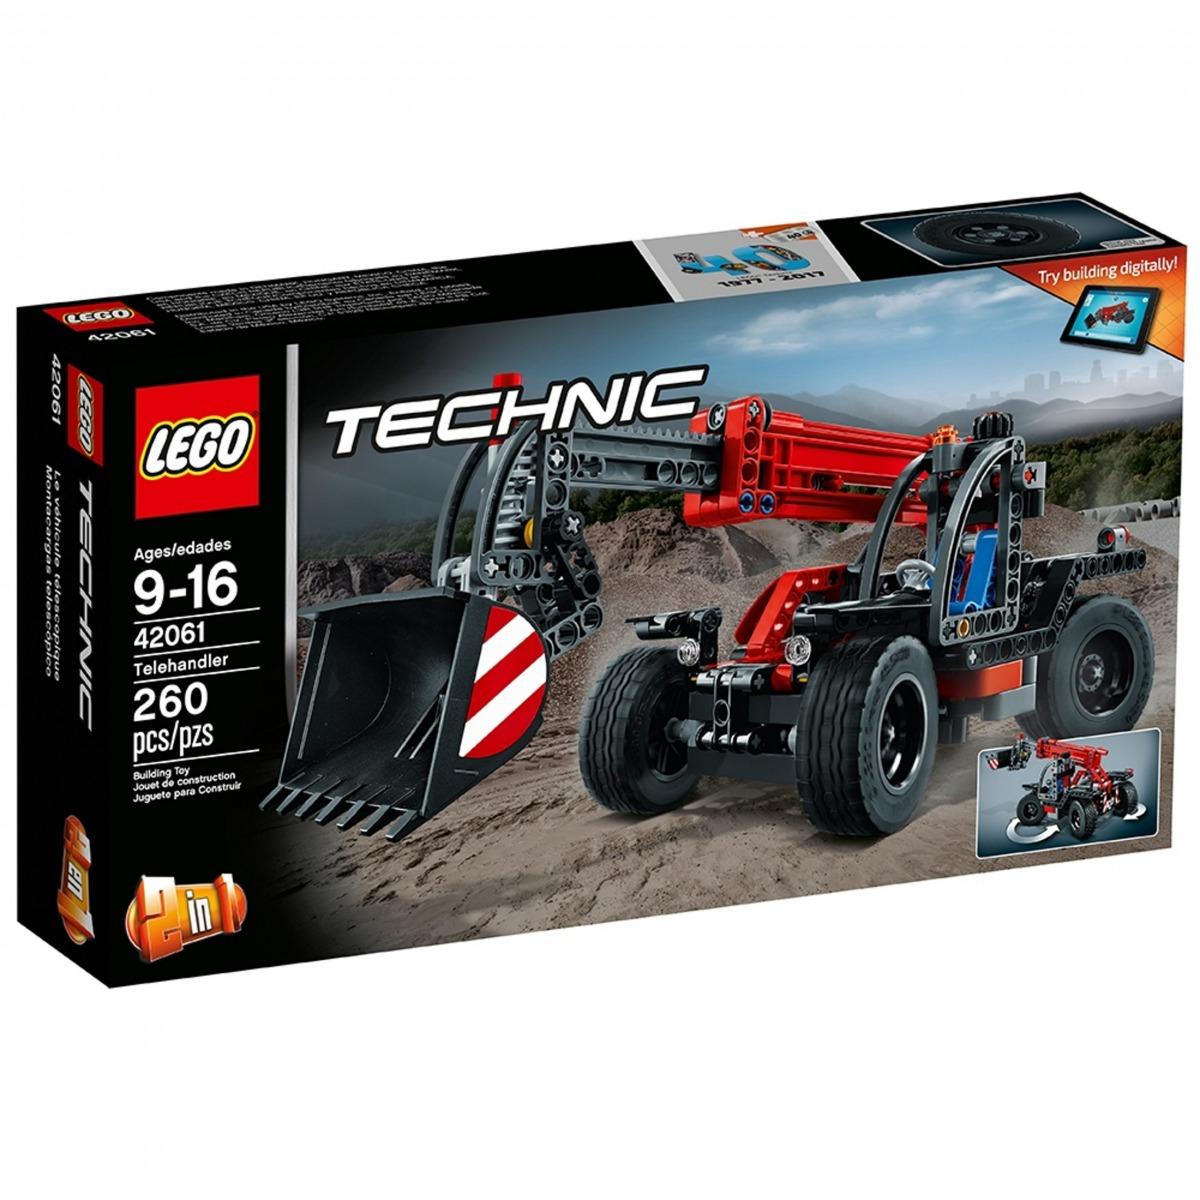 lego 42061 telehandler scaled